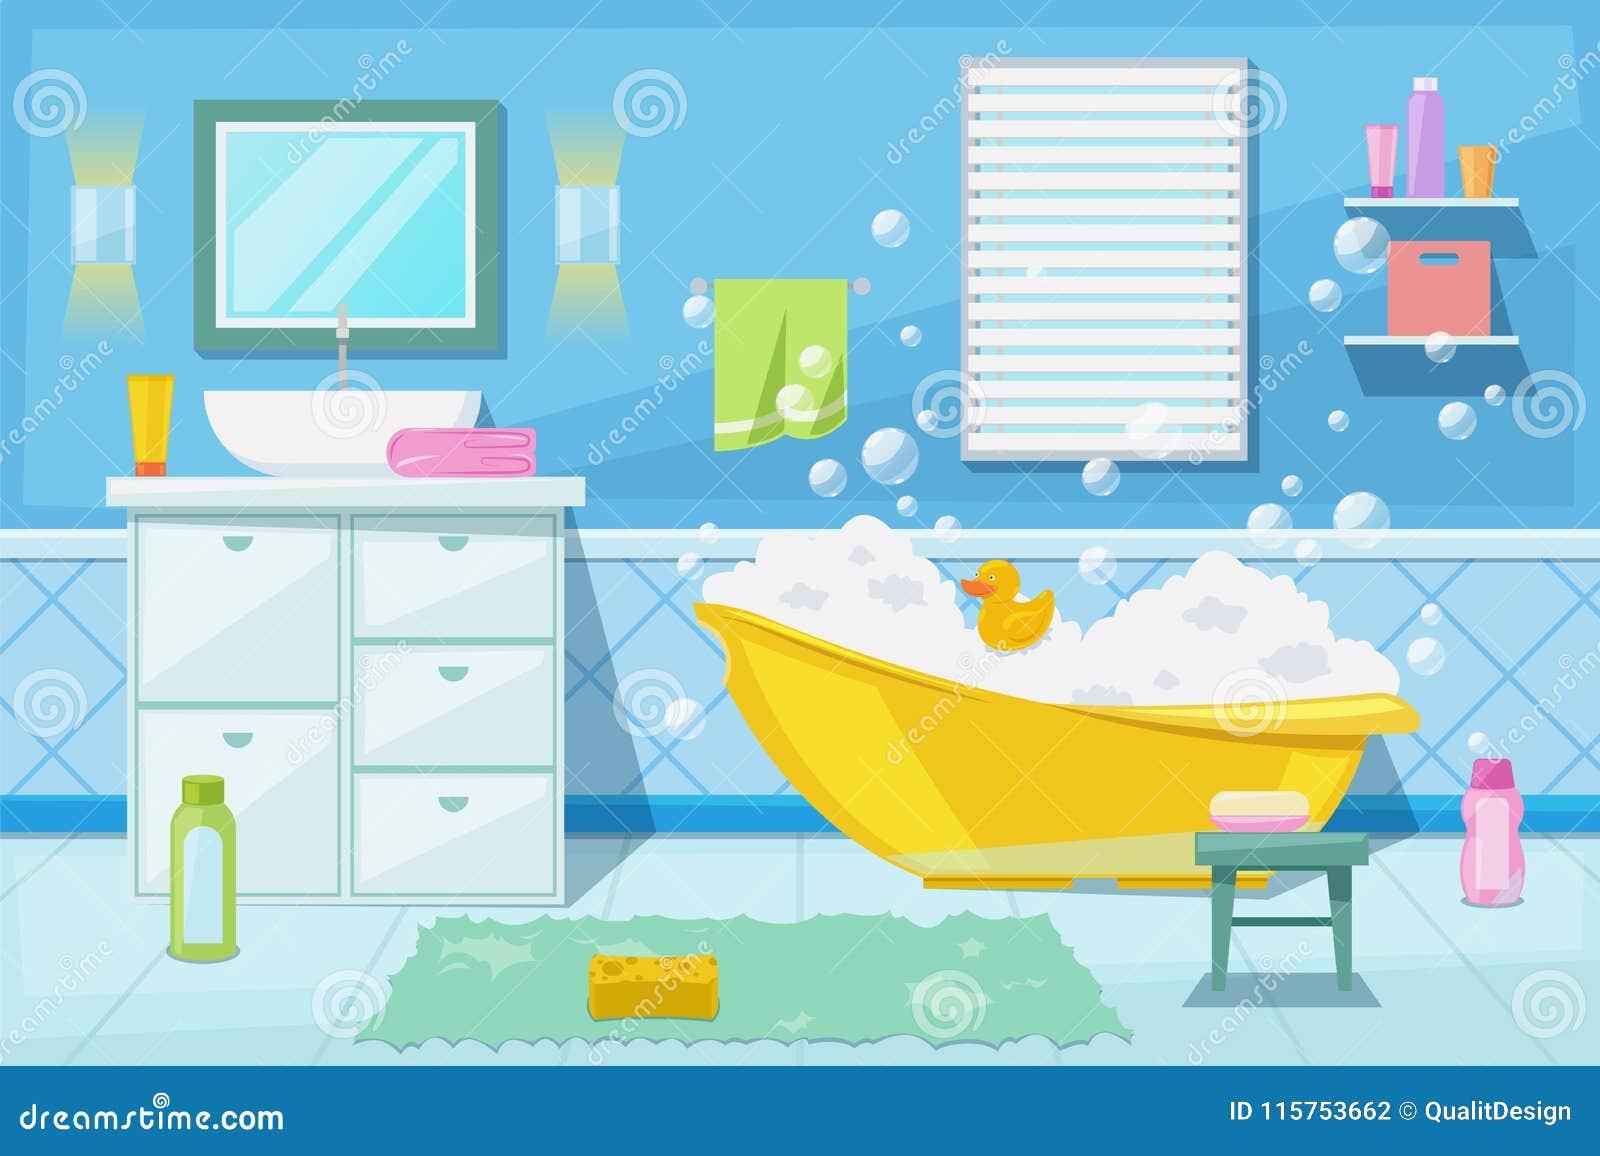 Baby Shower And Bath Room Interior, Vector Cartoon ...